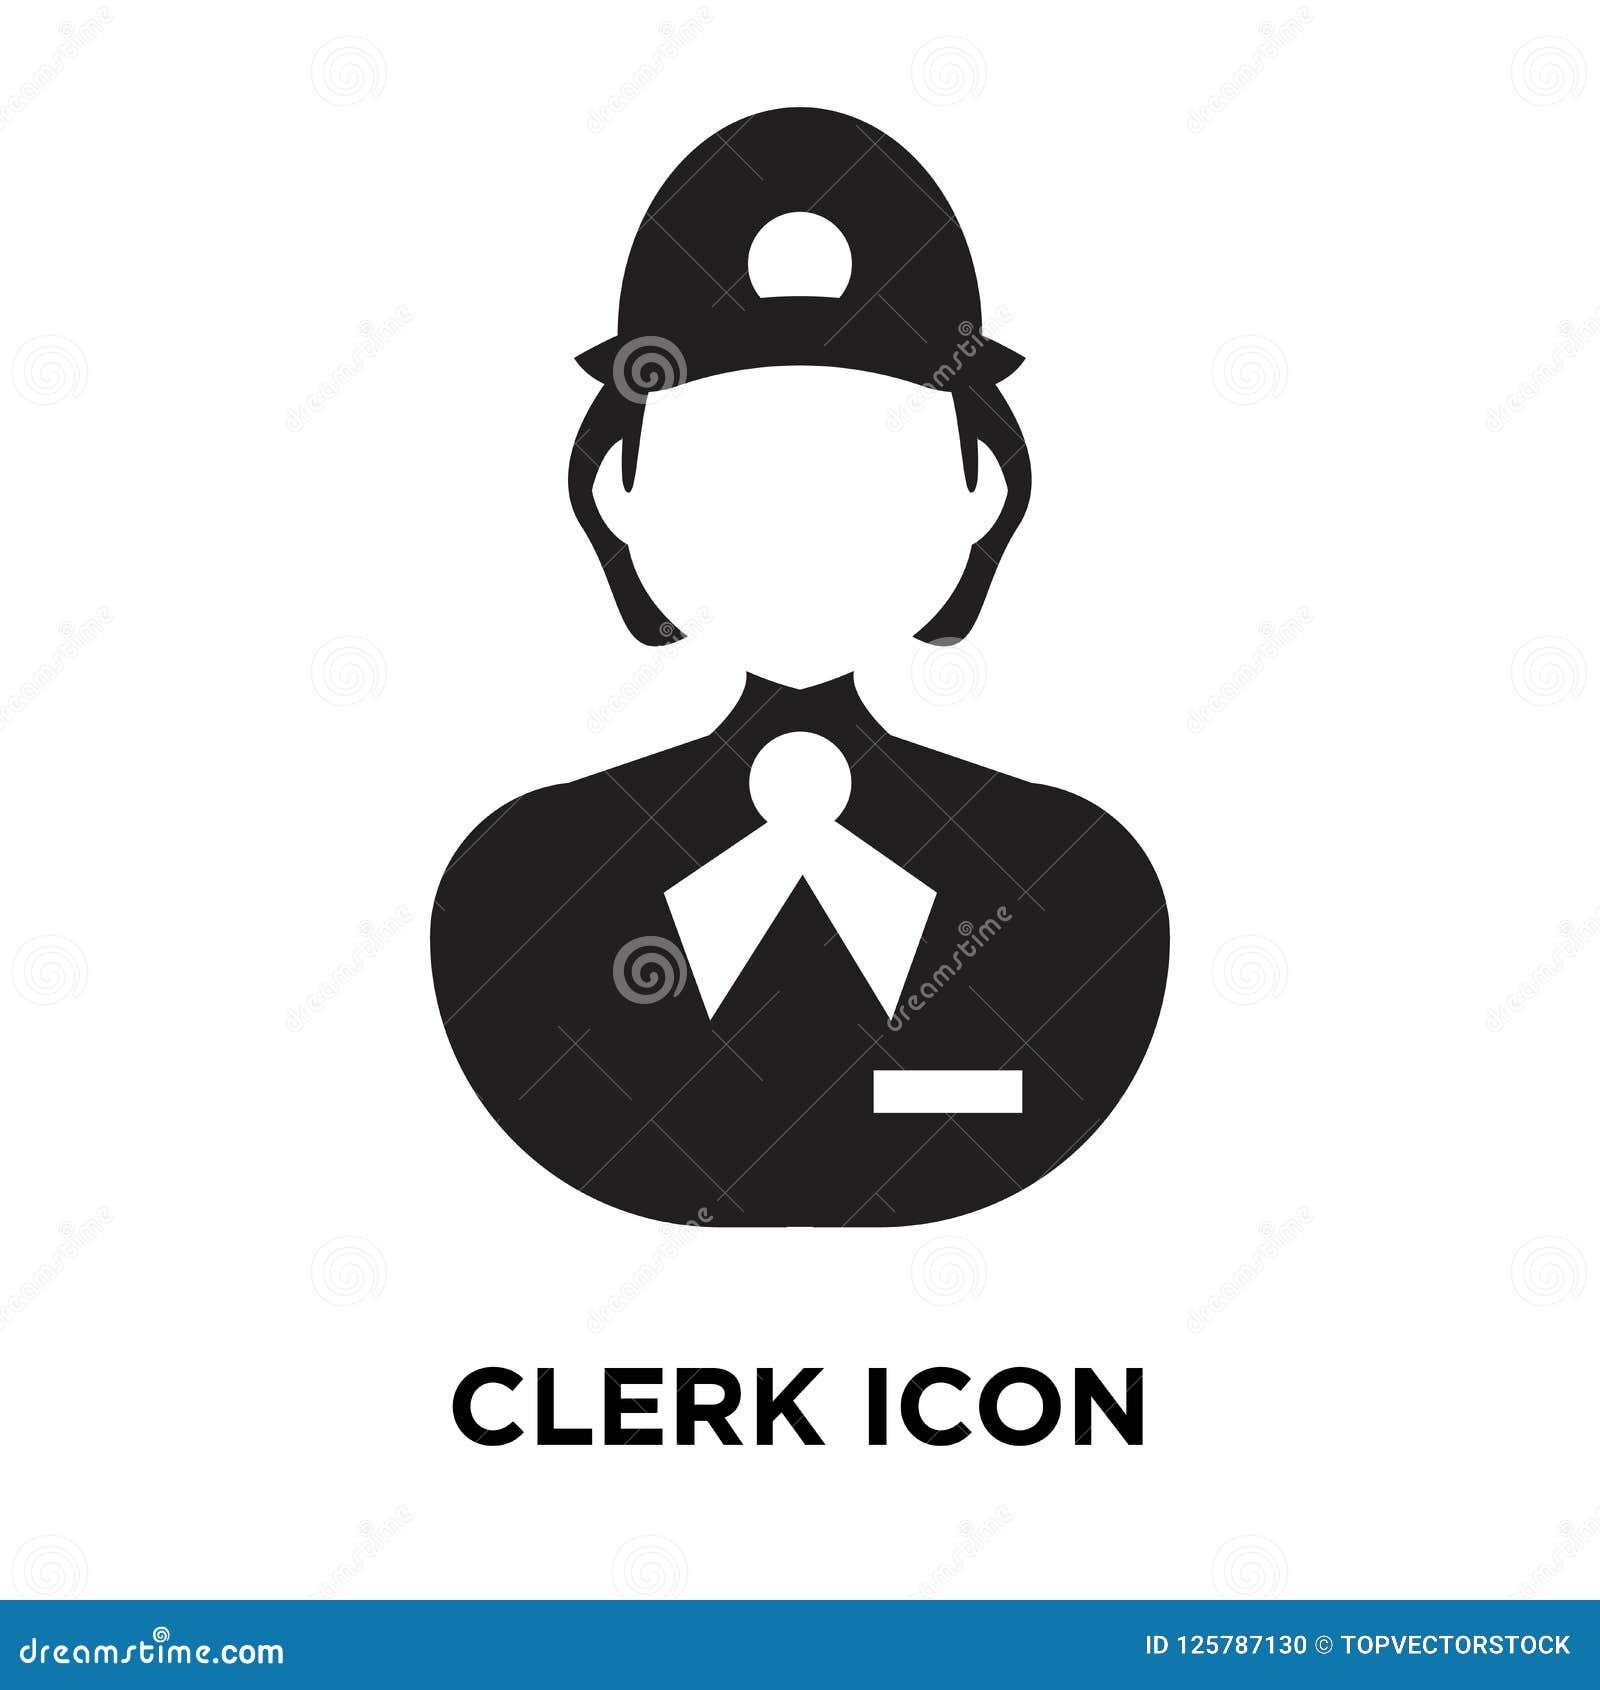 Supermarket Logo Concept: Clerk Icon Vector Isolated On White Background, Logo